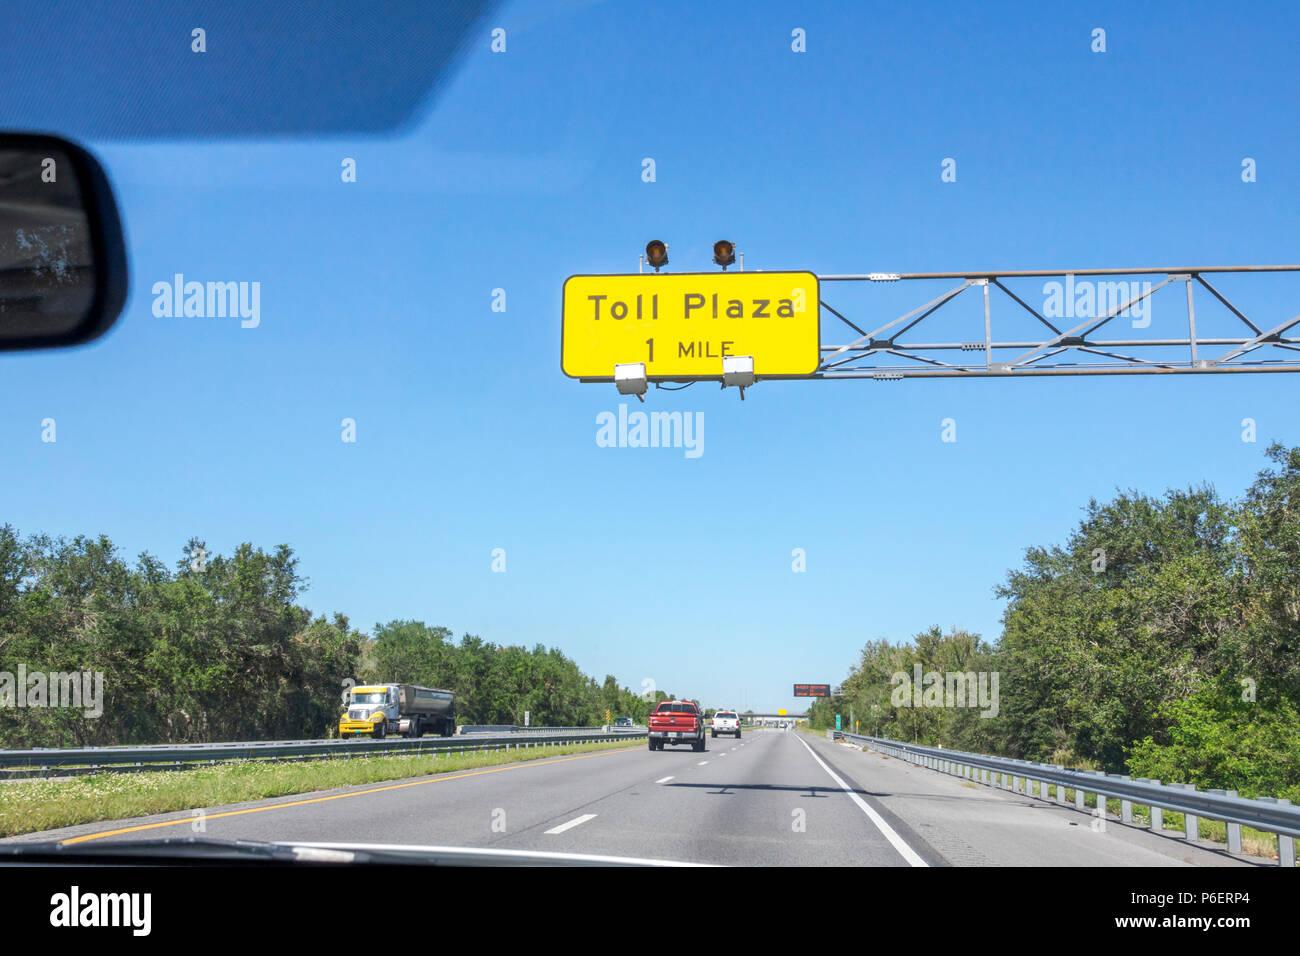 Fort Ft. Pierce Florida Florida Turnpike Toll Road plaza Entfernung Hinweisschild Fahrbahn Highway Traffic Stockbild